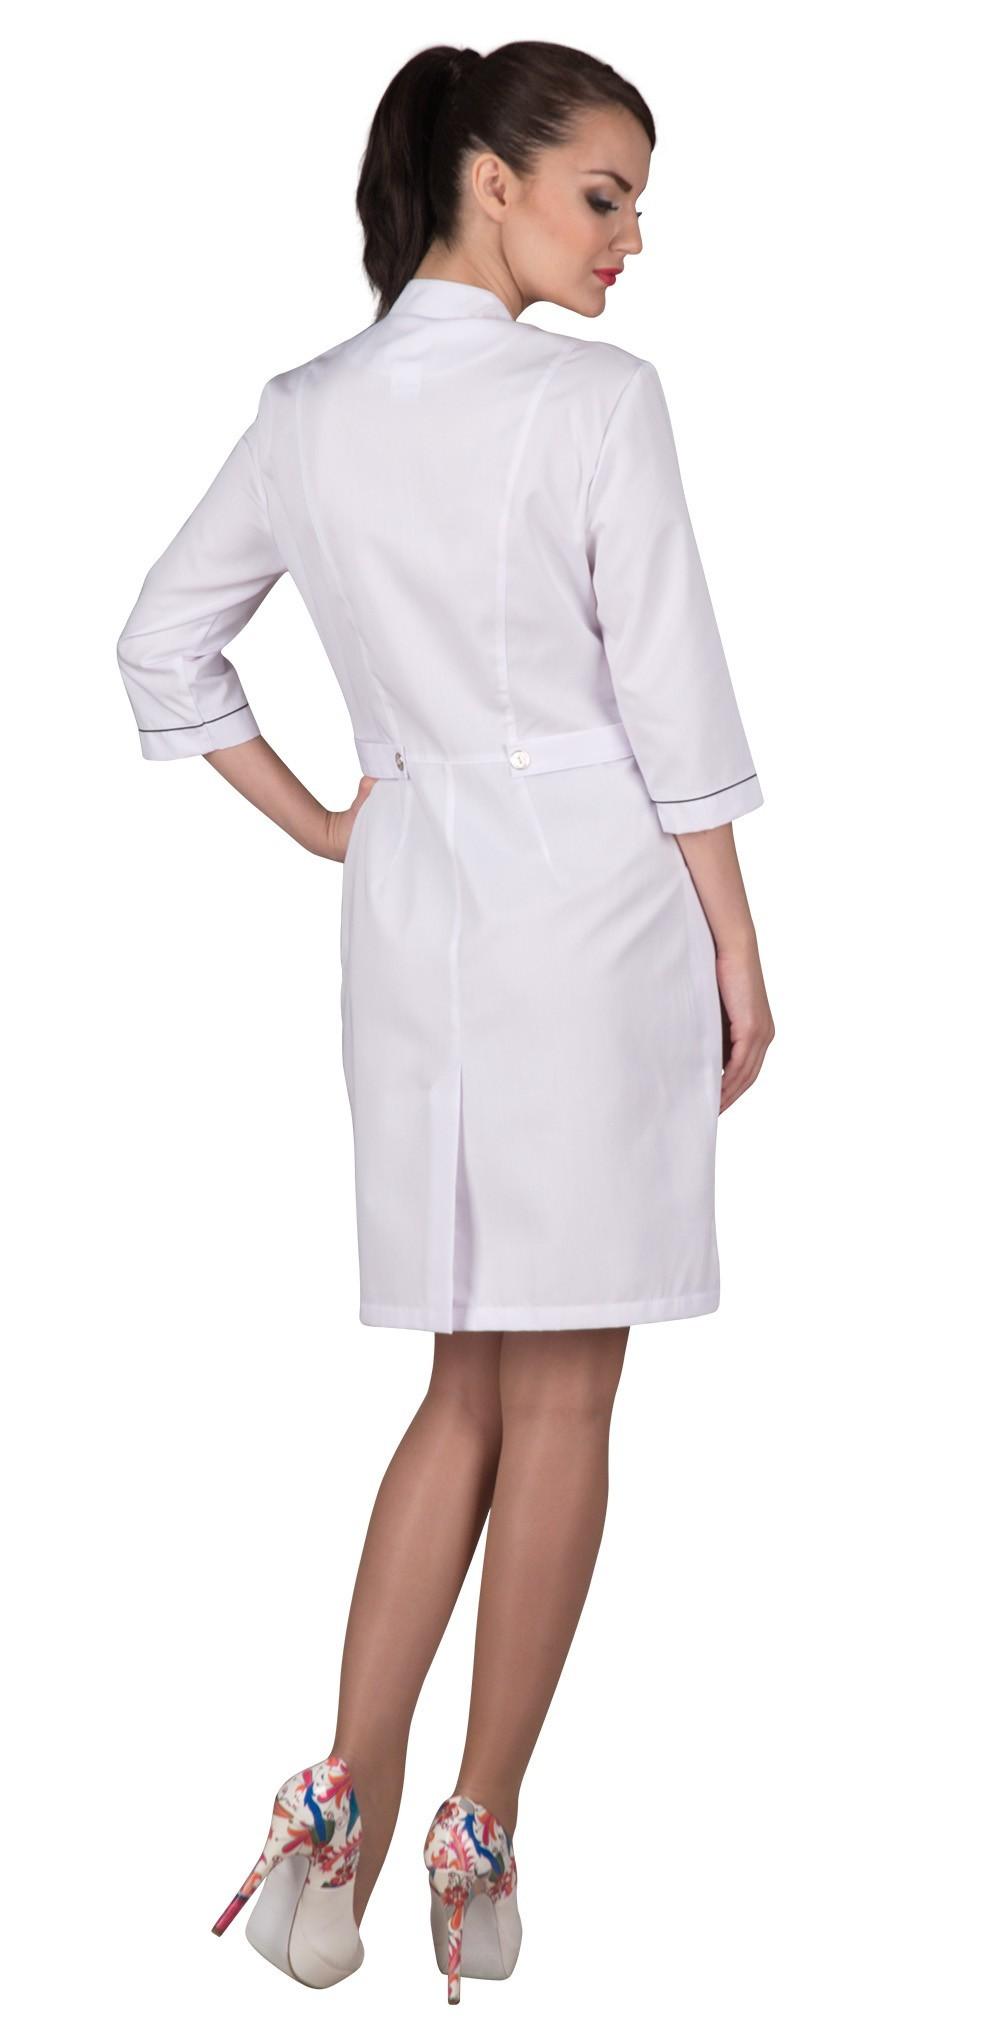 Белый медицинский женский халат Х-226 сатори